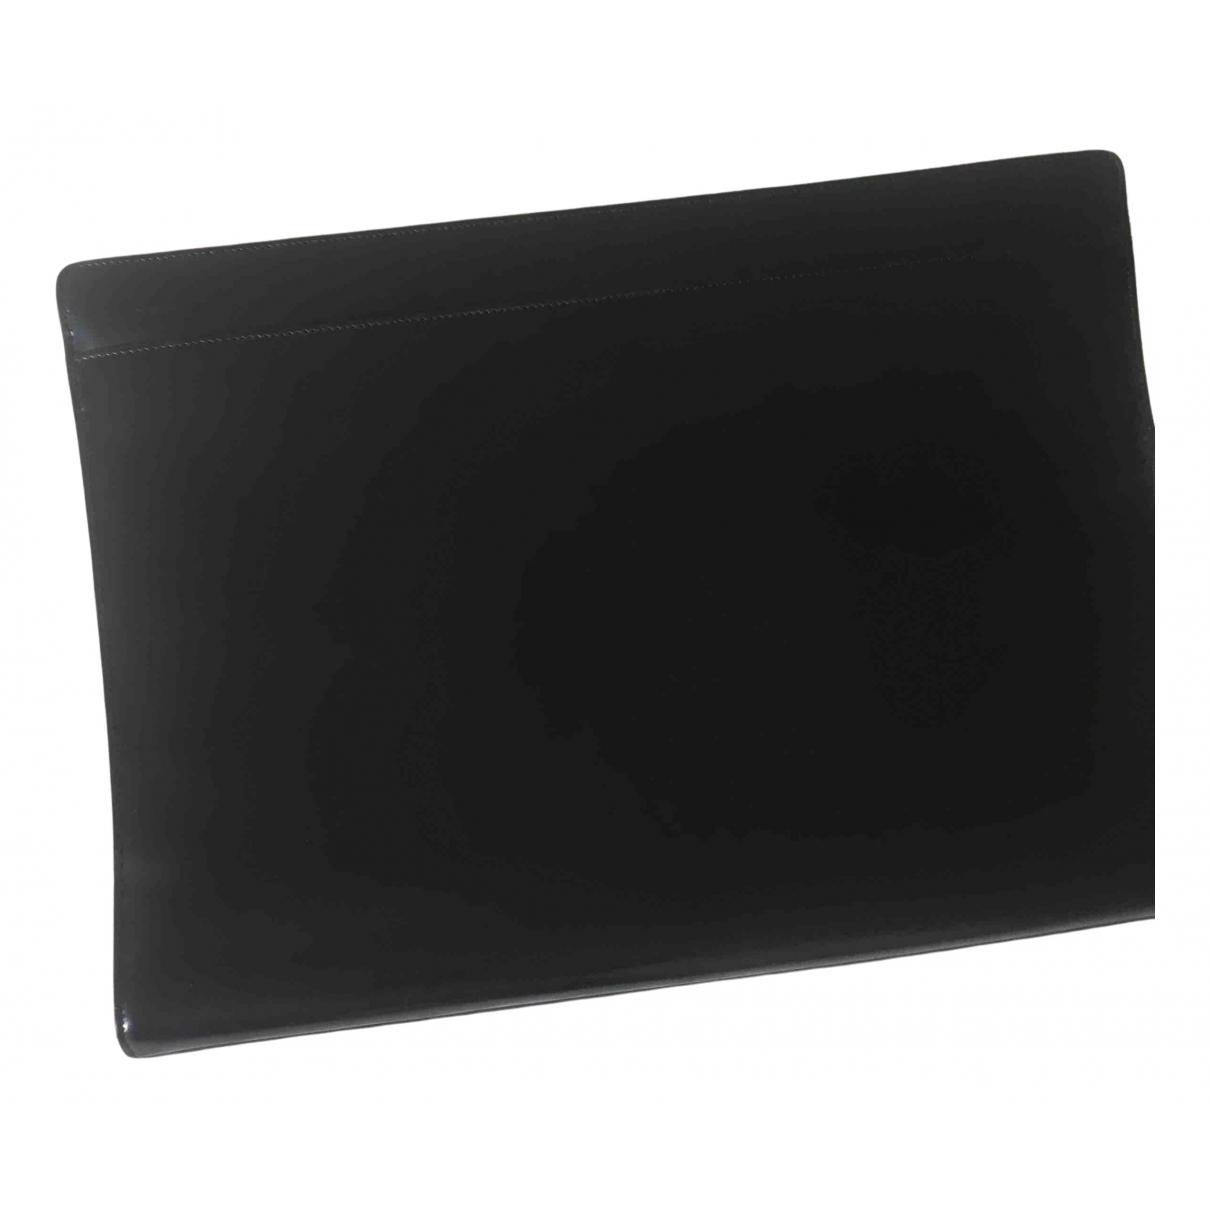 Bally \N Kleinlederwaren in  Schwarz Leder